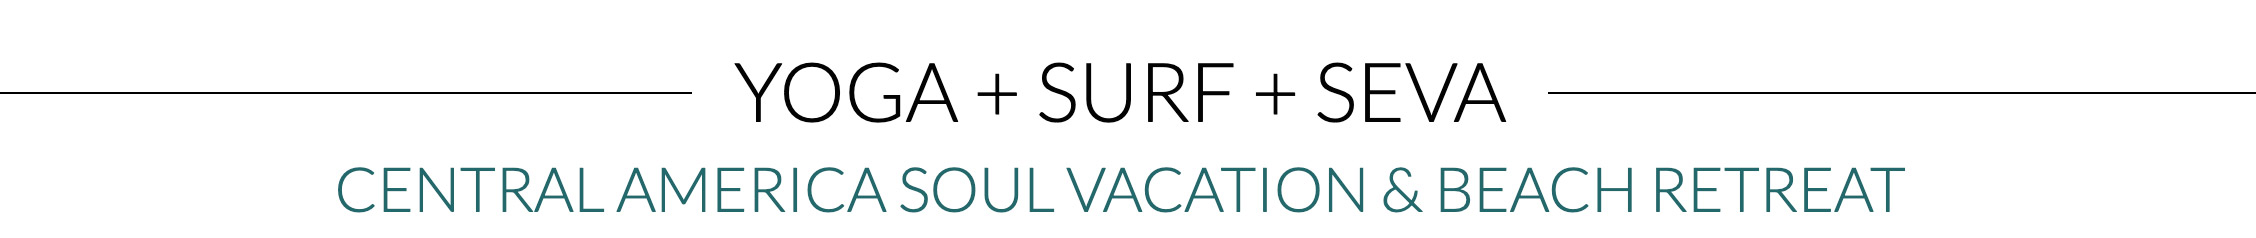 yoga surf seva central america